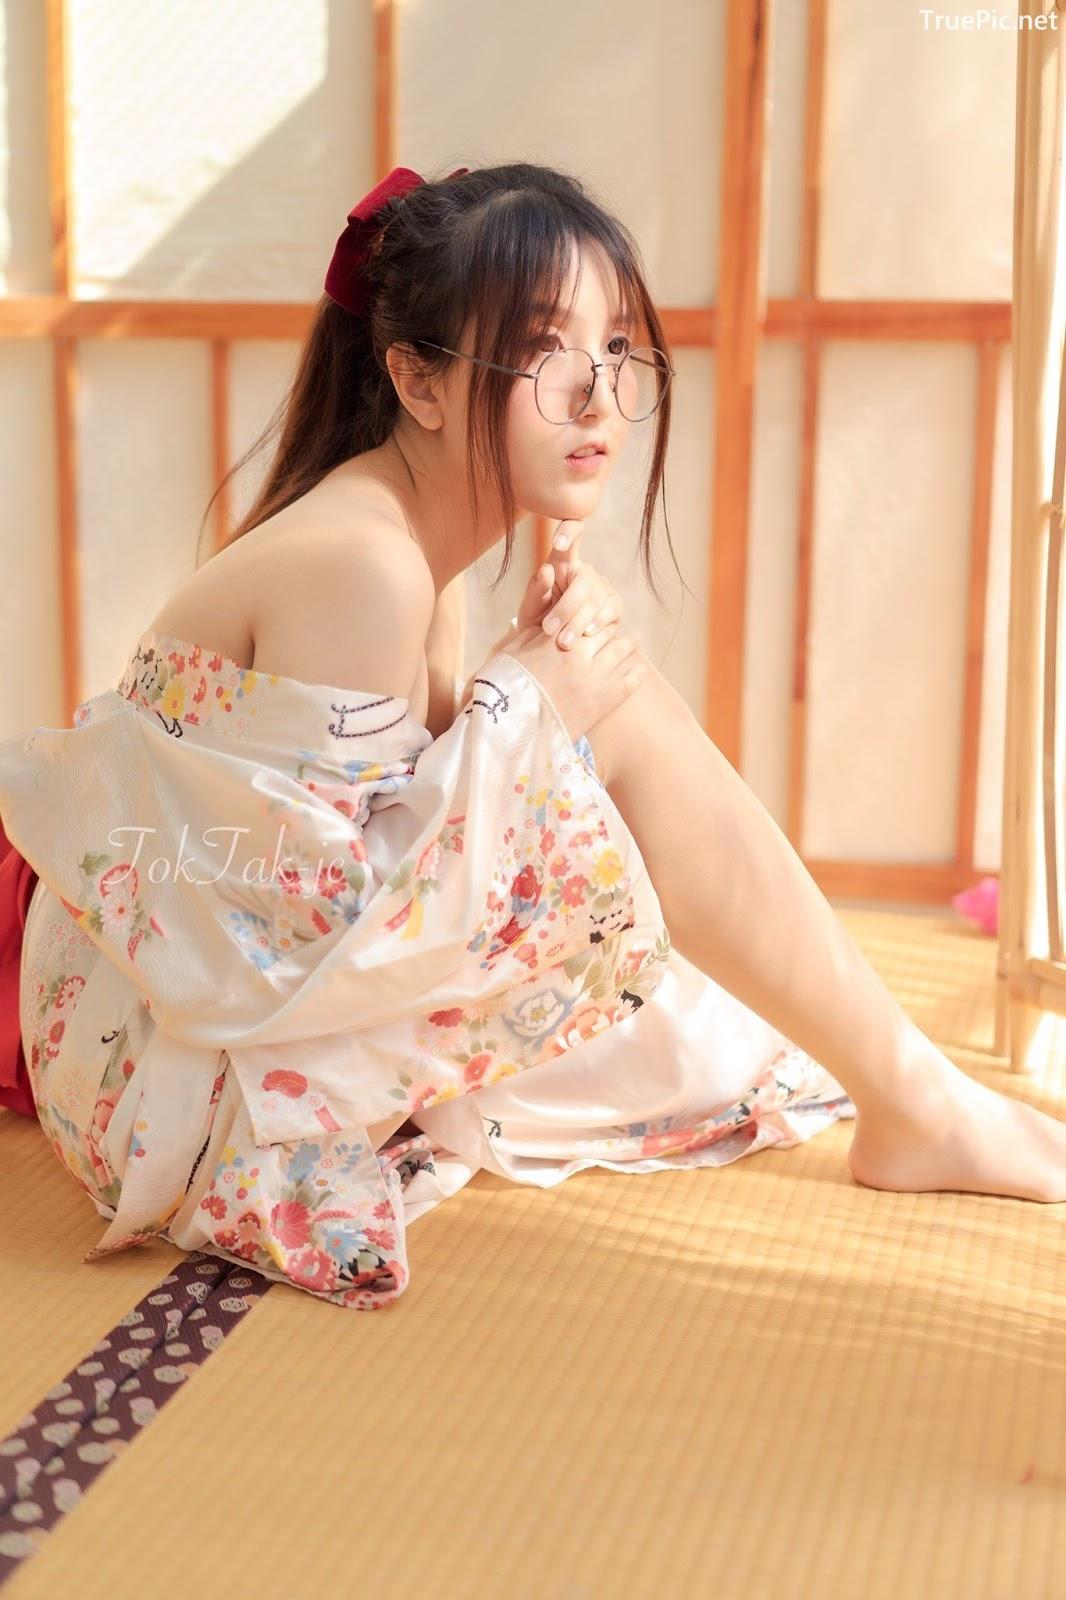 Image Thailand Model - Phunnita Intarapimai - Sexy Kendo Girl - TruePic.net - Picture-3